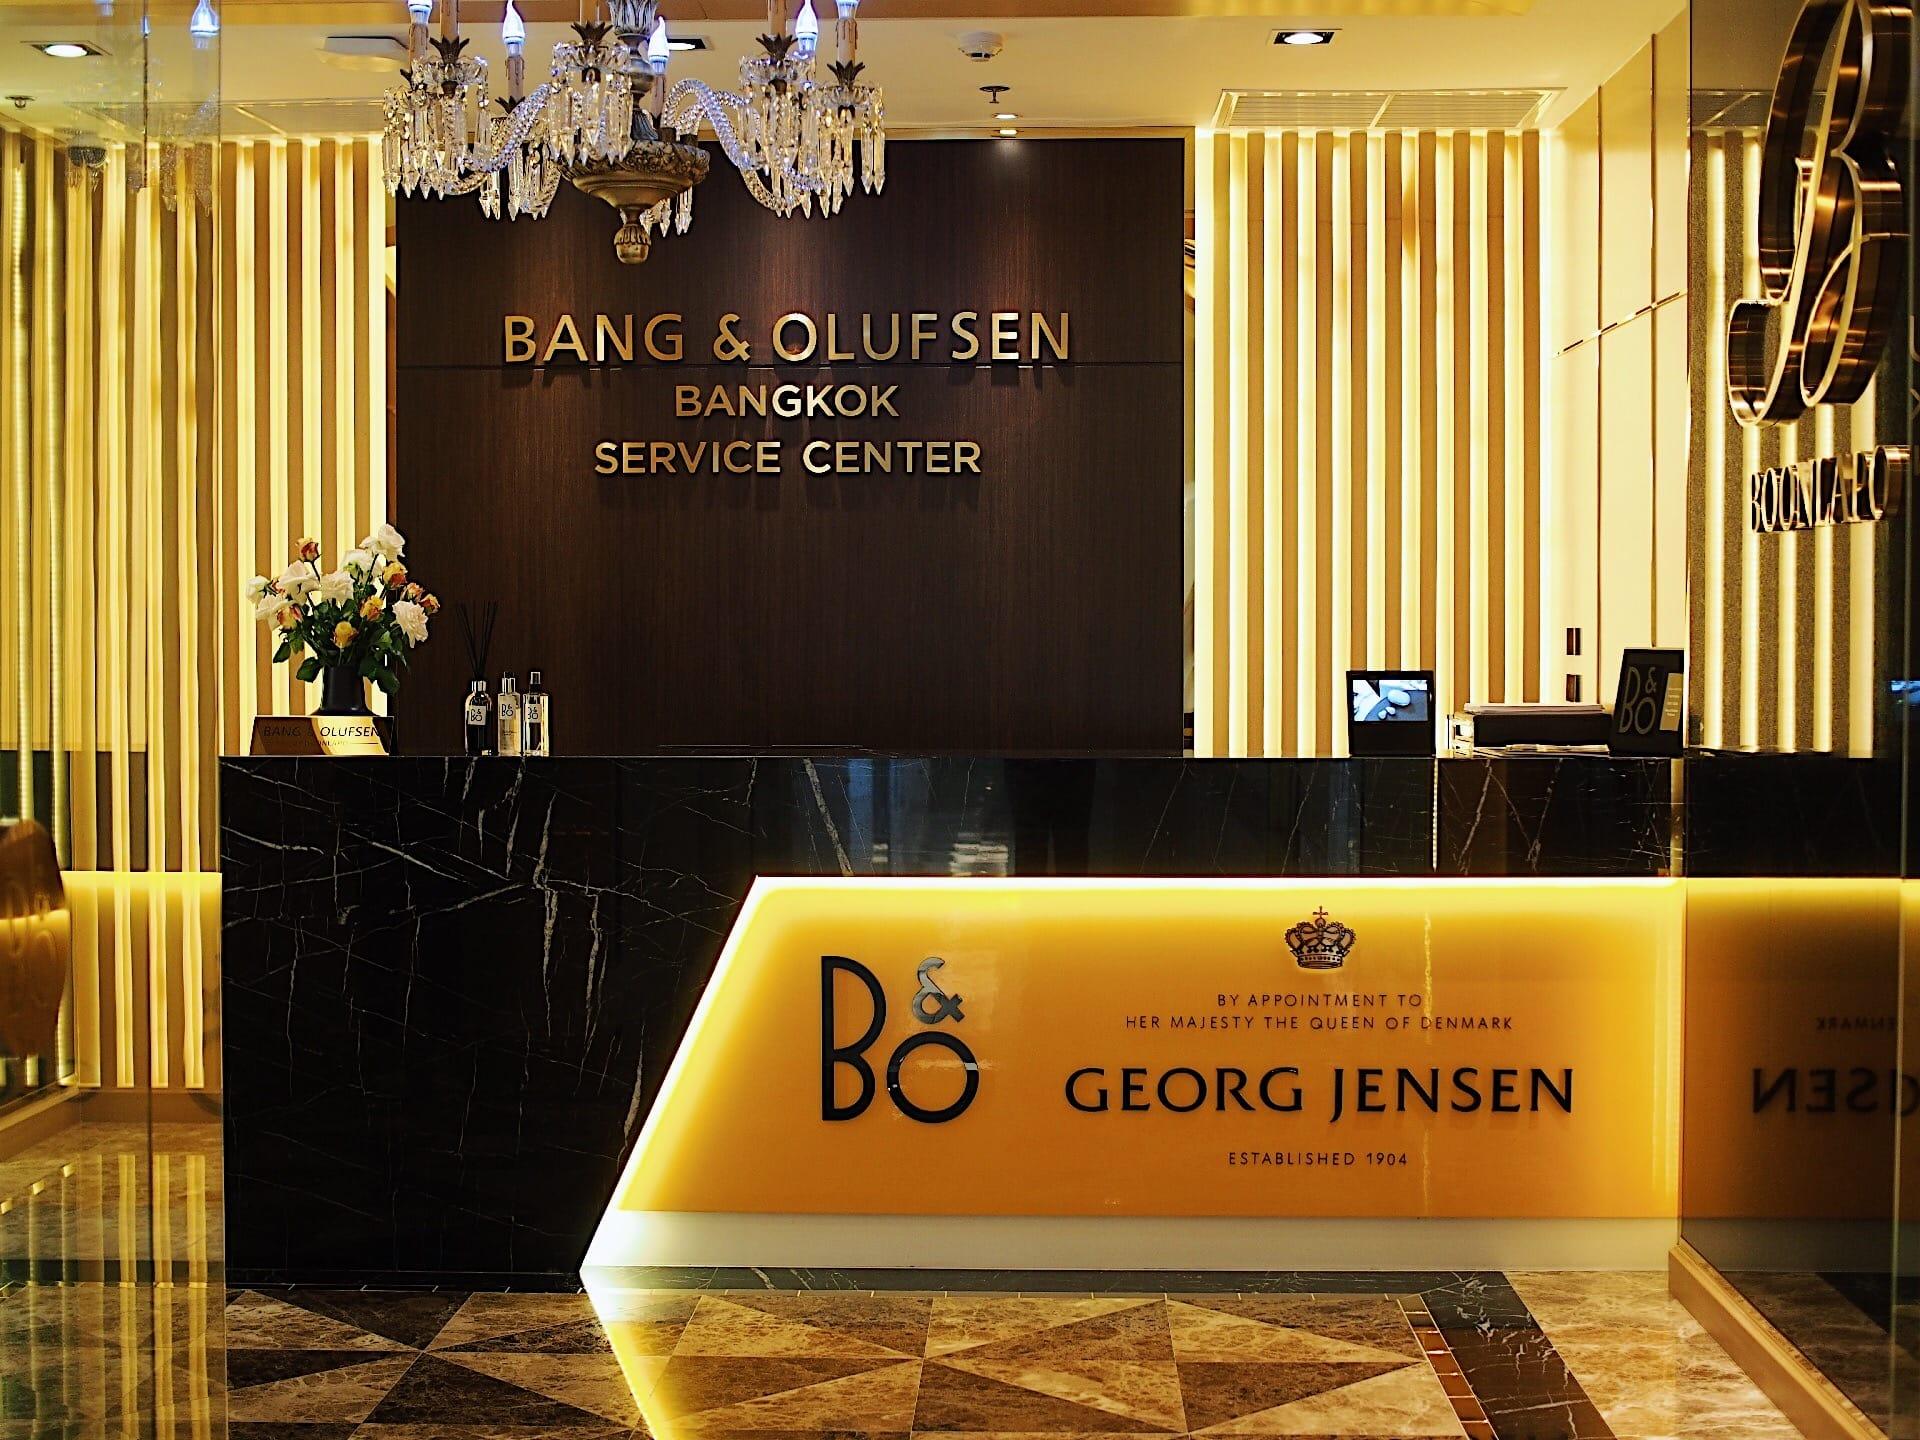 B&O Service Center